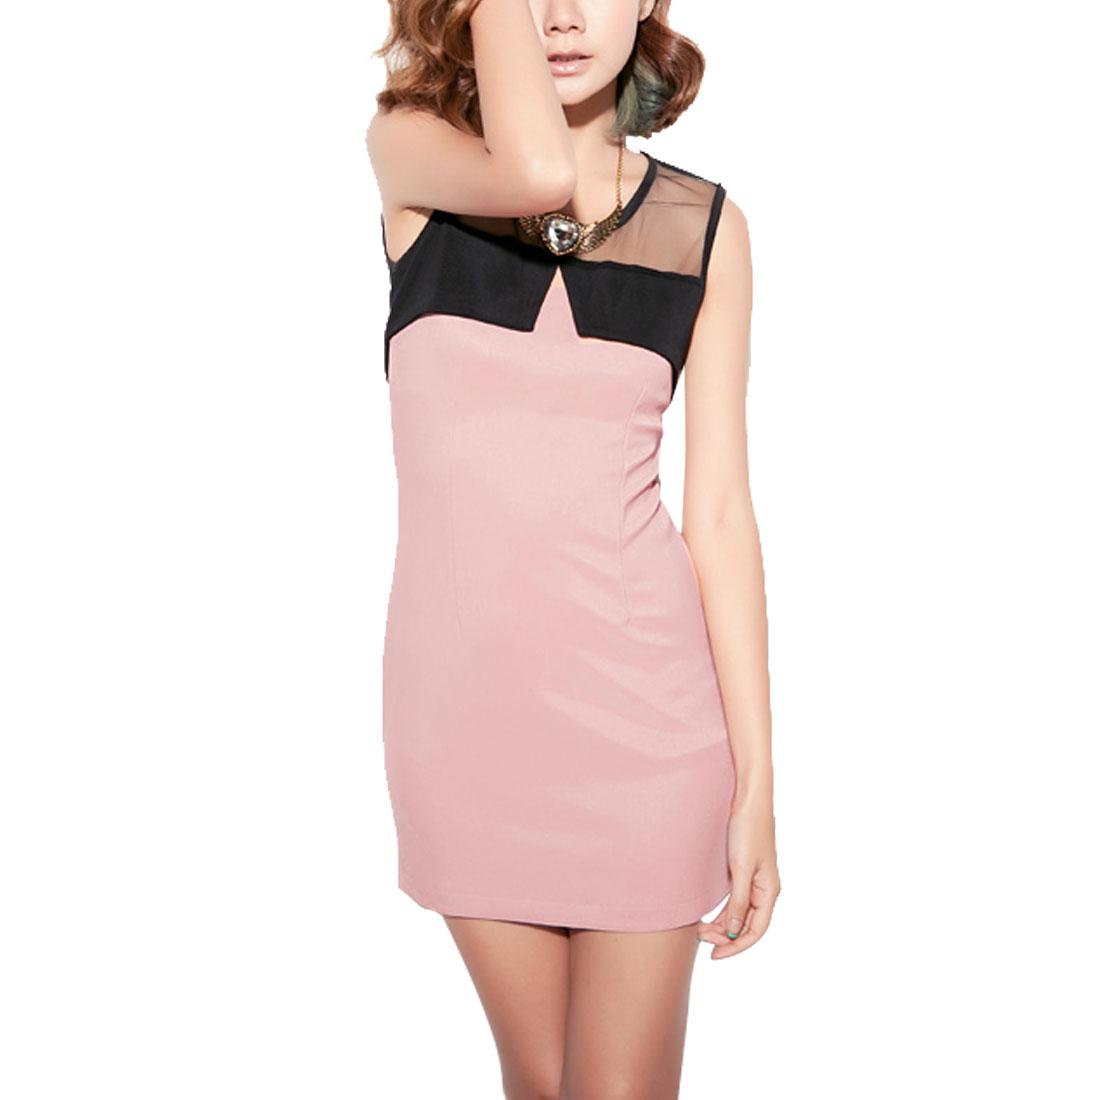 Woman Mesh Sheer Round Neck Tank Mini Dress Pink Black XS